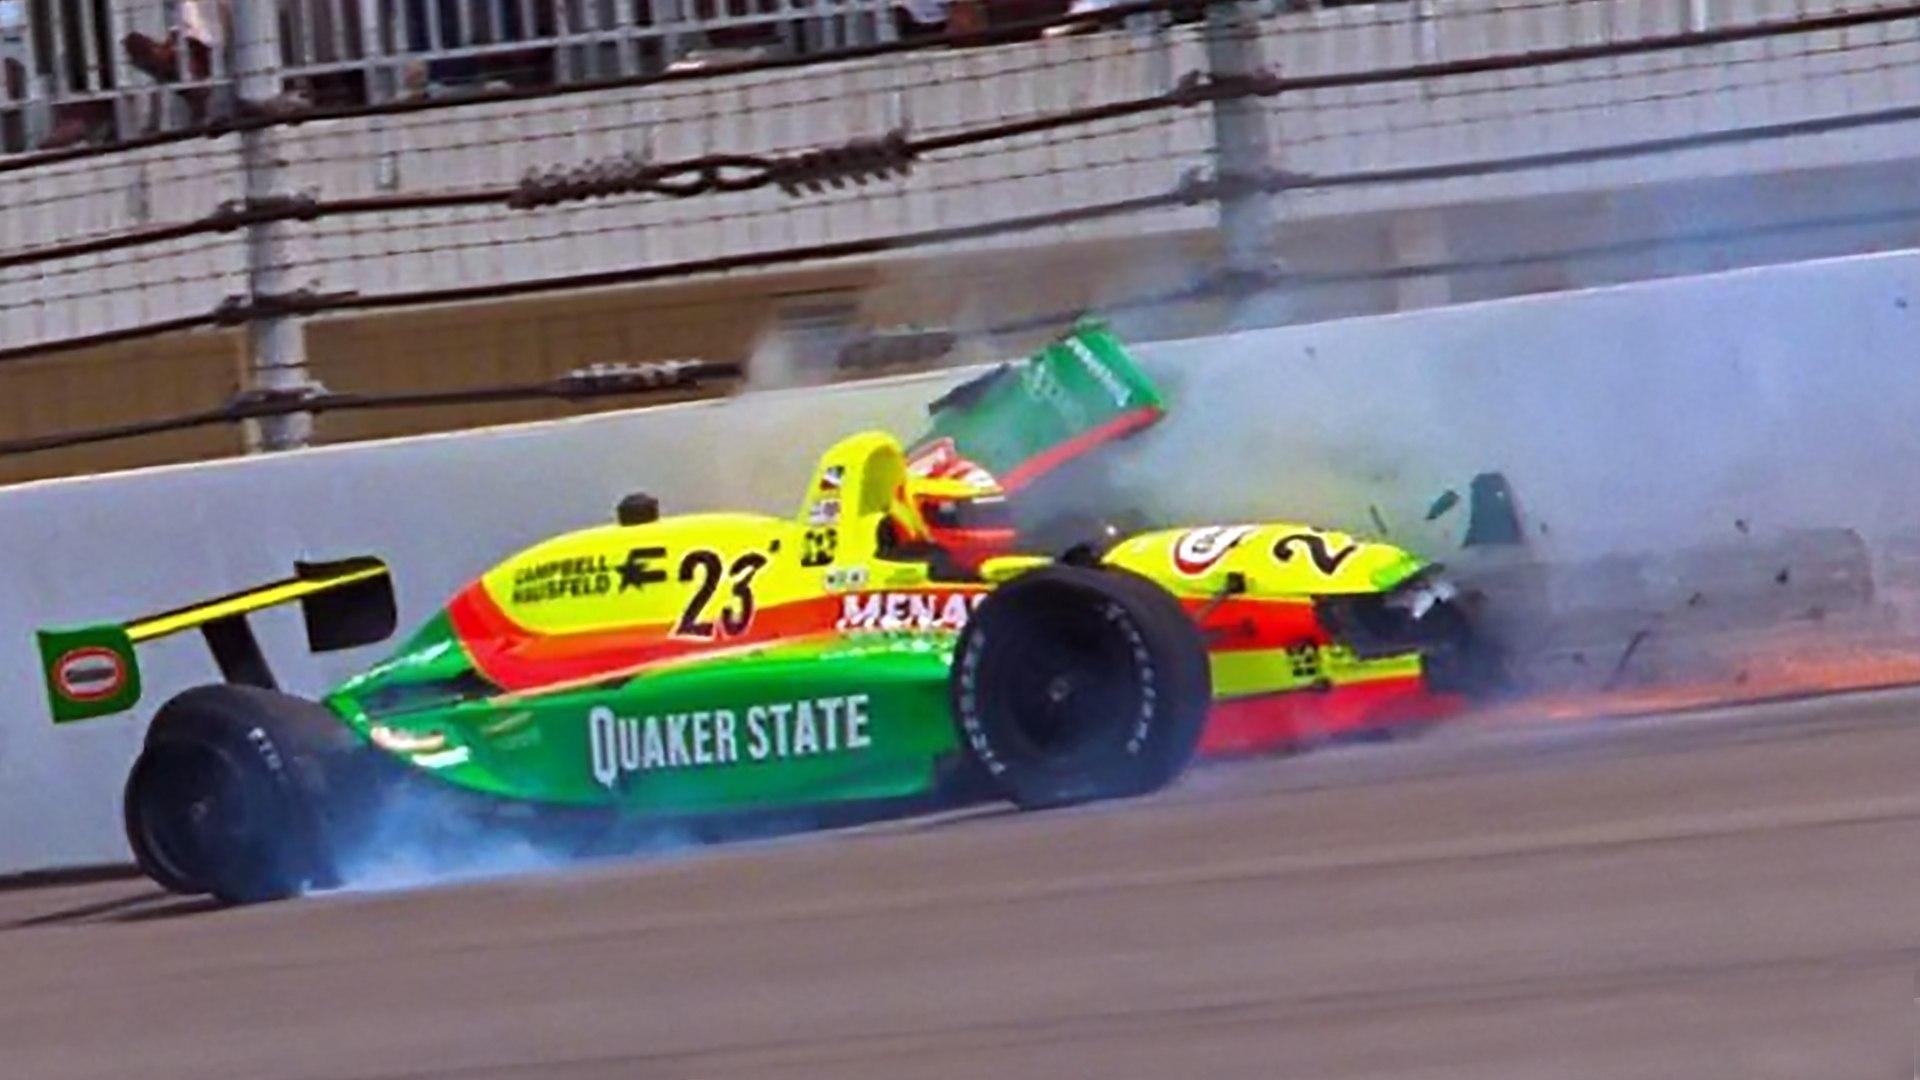 Scott Brayton fatal crash at Indy 500 (May 17, 1996) ALL ANGLES ...